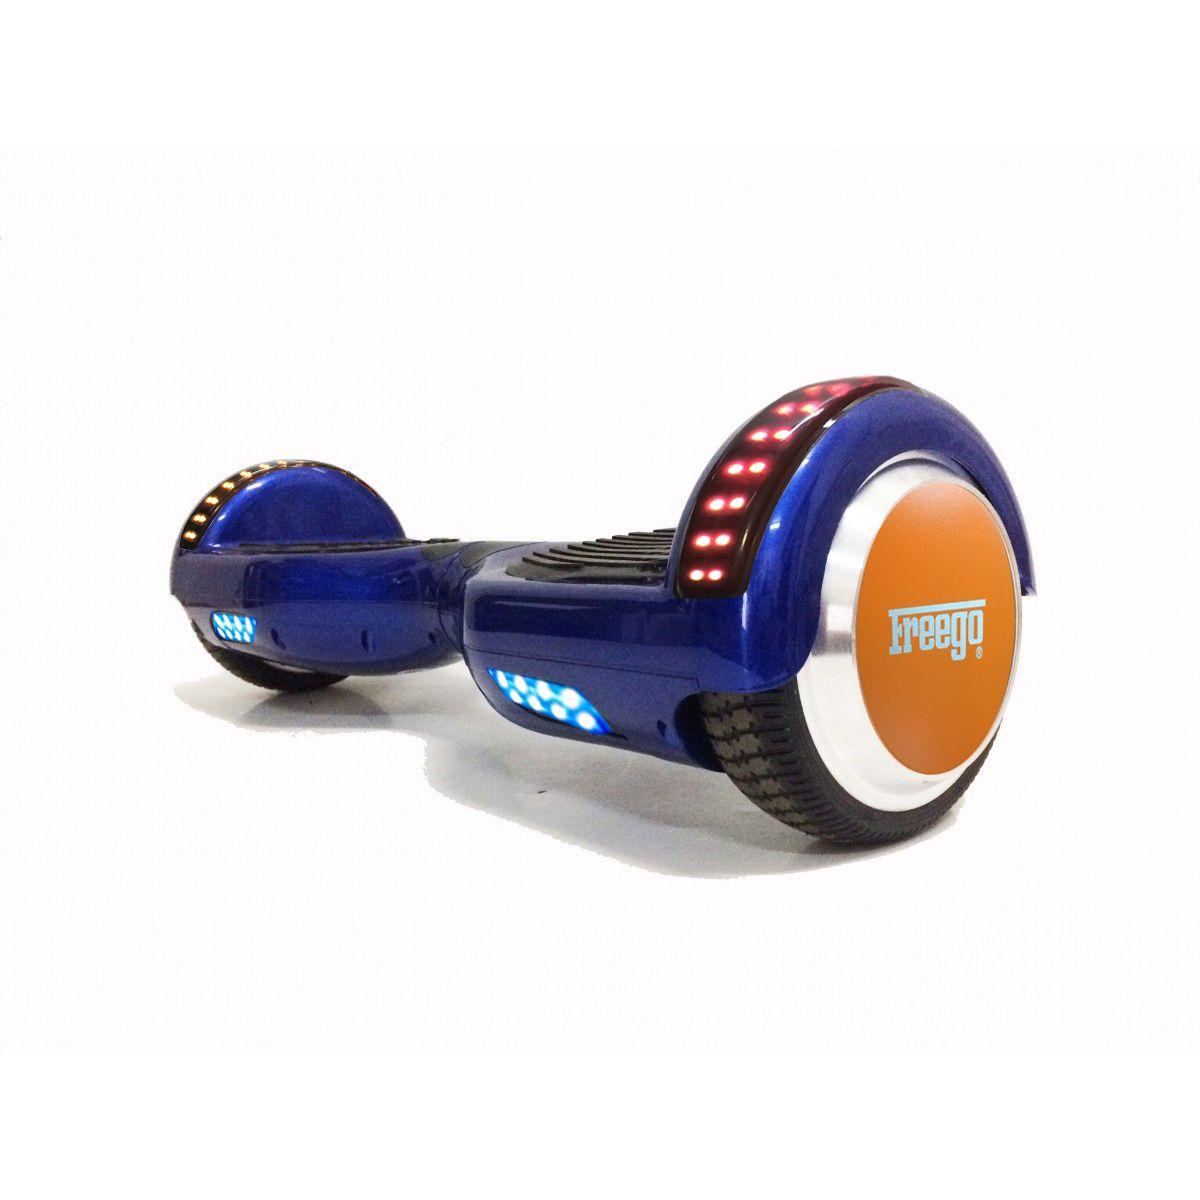 Hoverboard FREEGO  - Azul modelo 2018  - Loja Silver Box